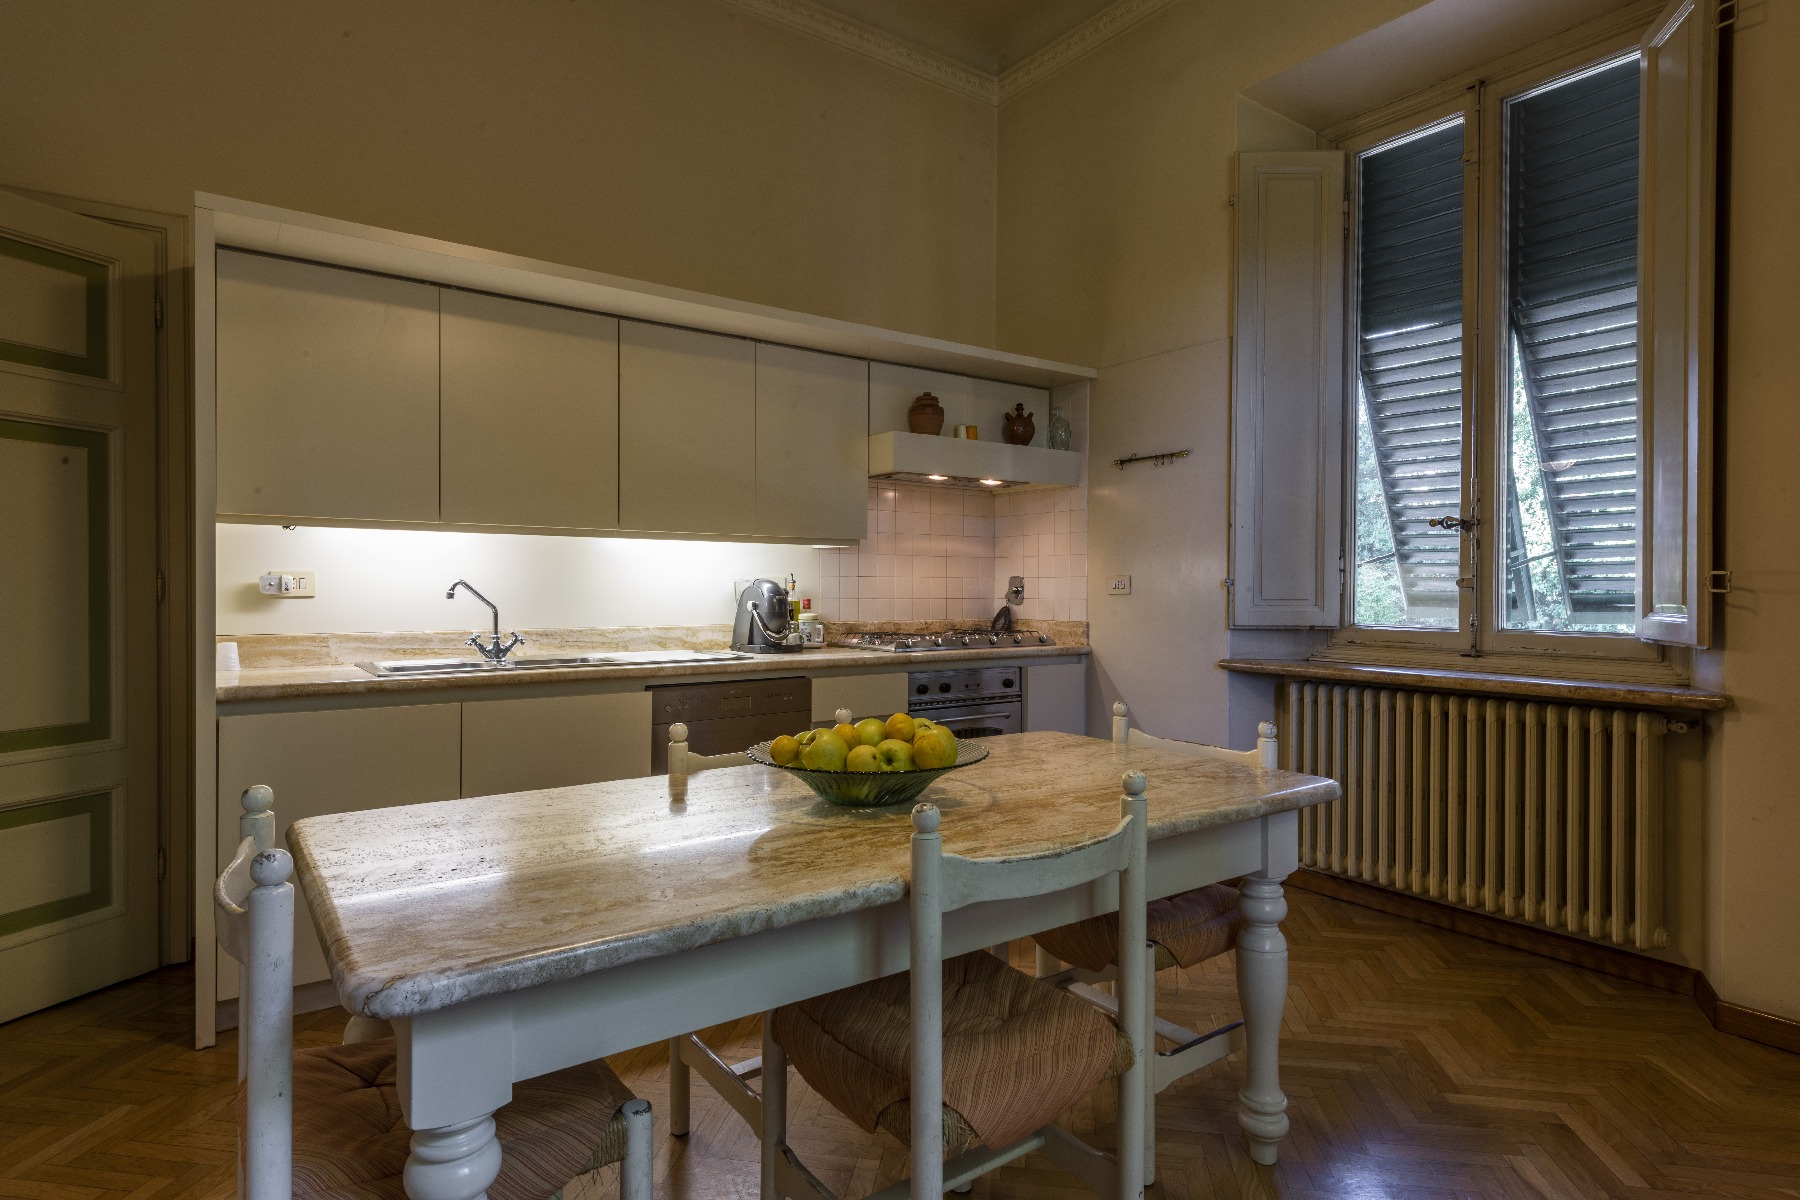 Villa in Vendita a Lucca: 5 locali, 660 mq - Foto 11